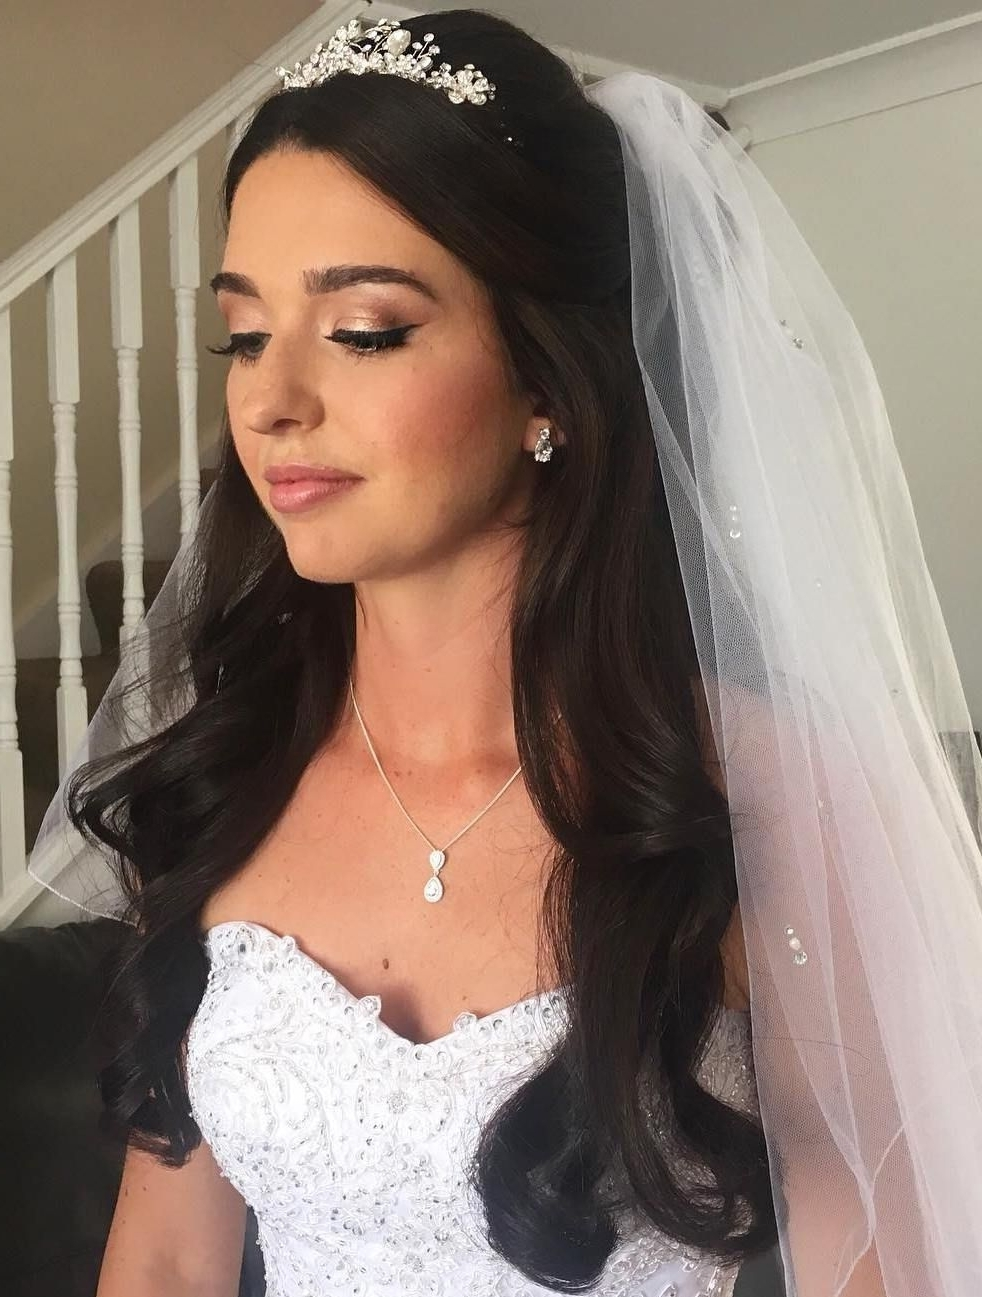 Bridal+Hair+For+Veil+And+Tiara (View 4 of 15)